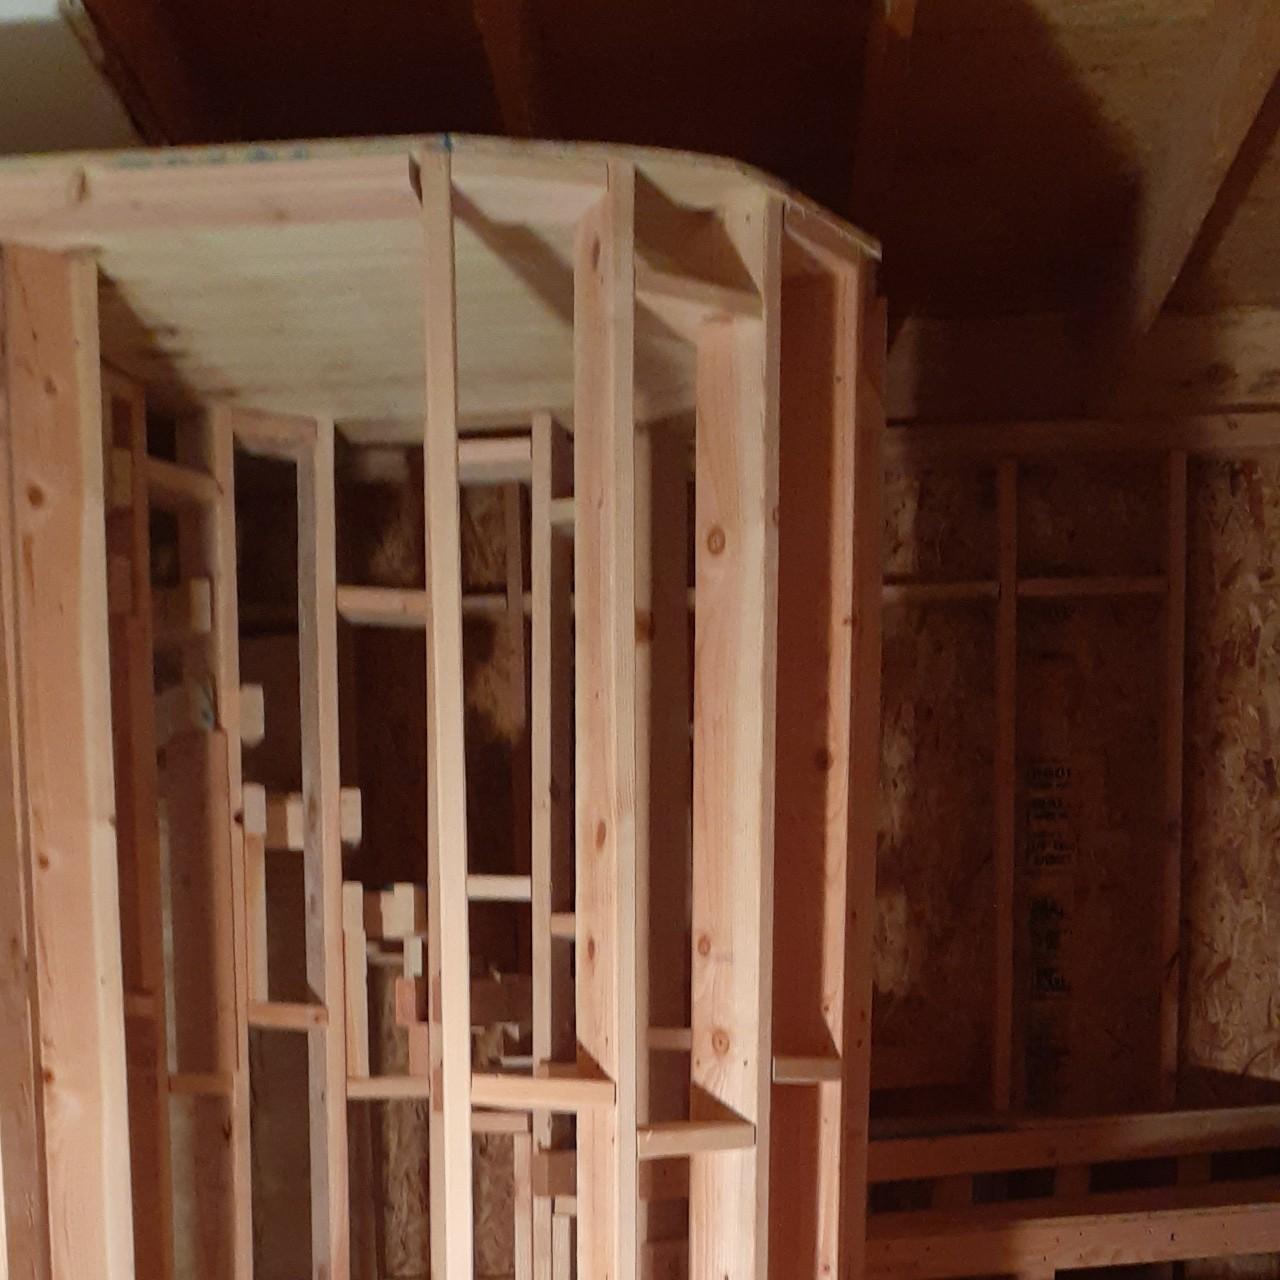 carpentry-wood-framing-second-floor-home-addition--framing-31